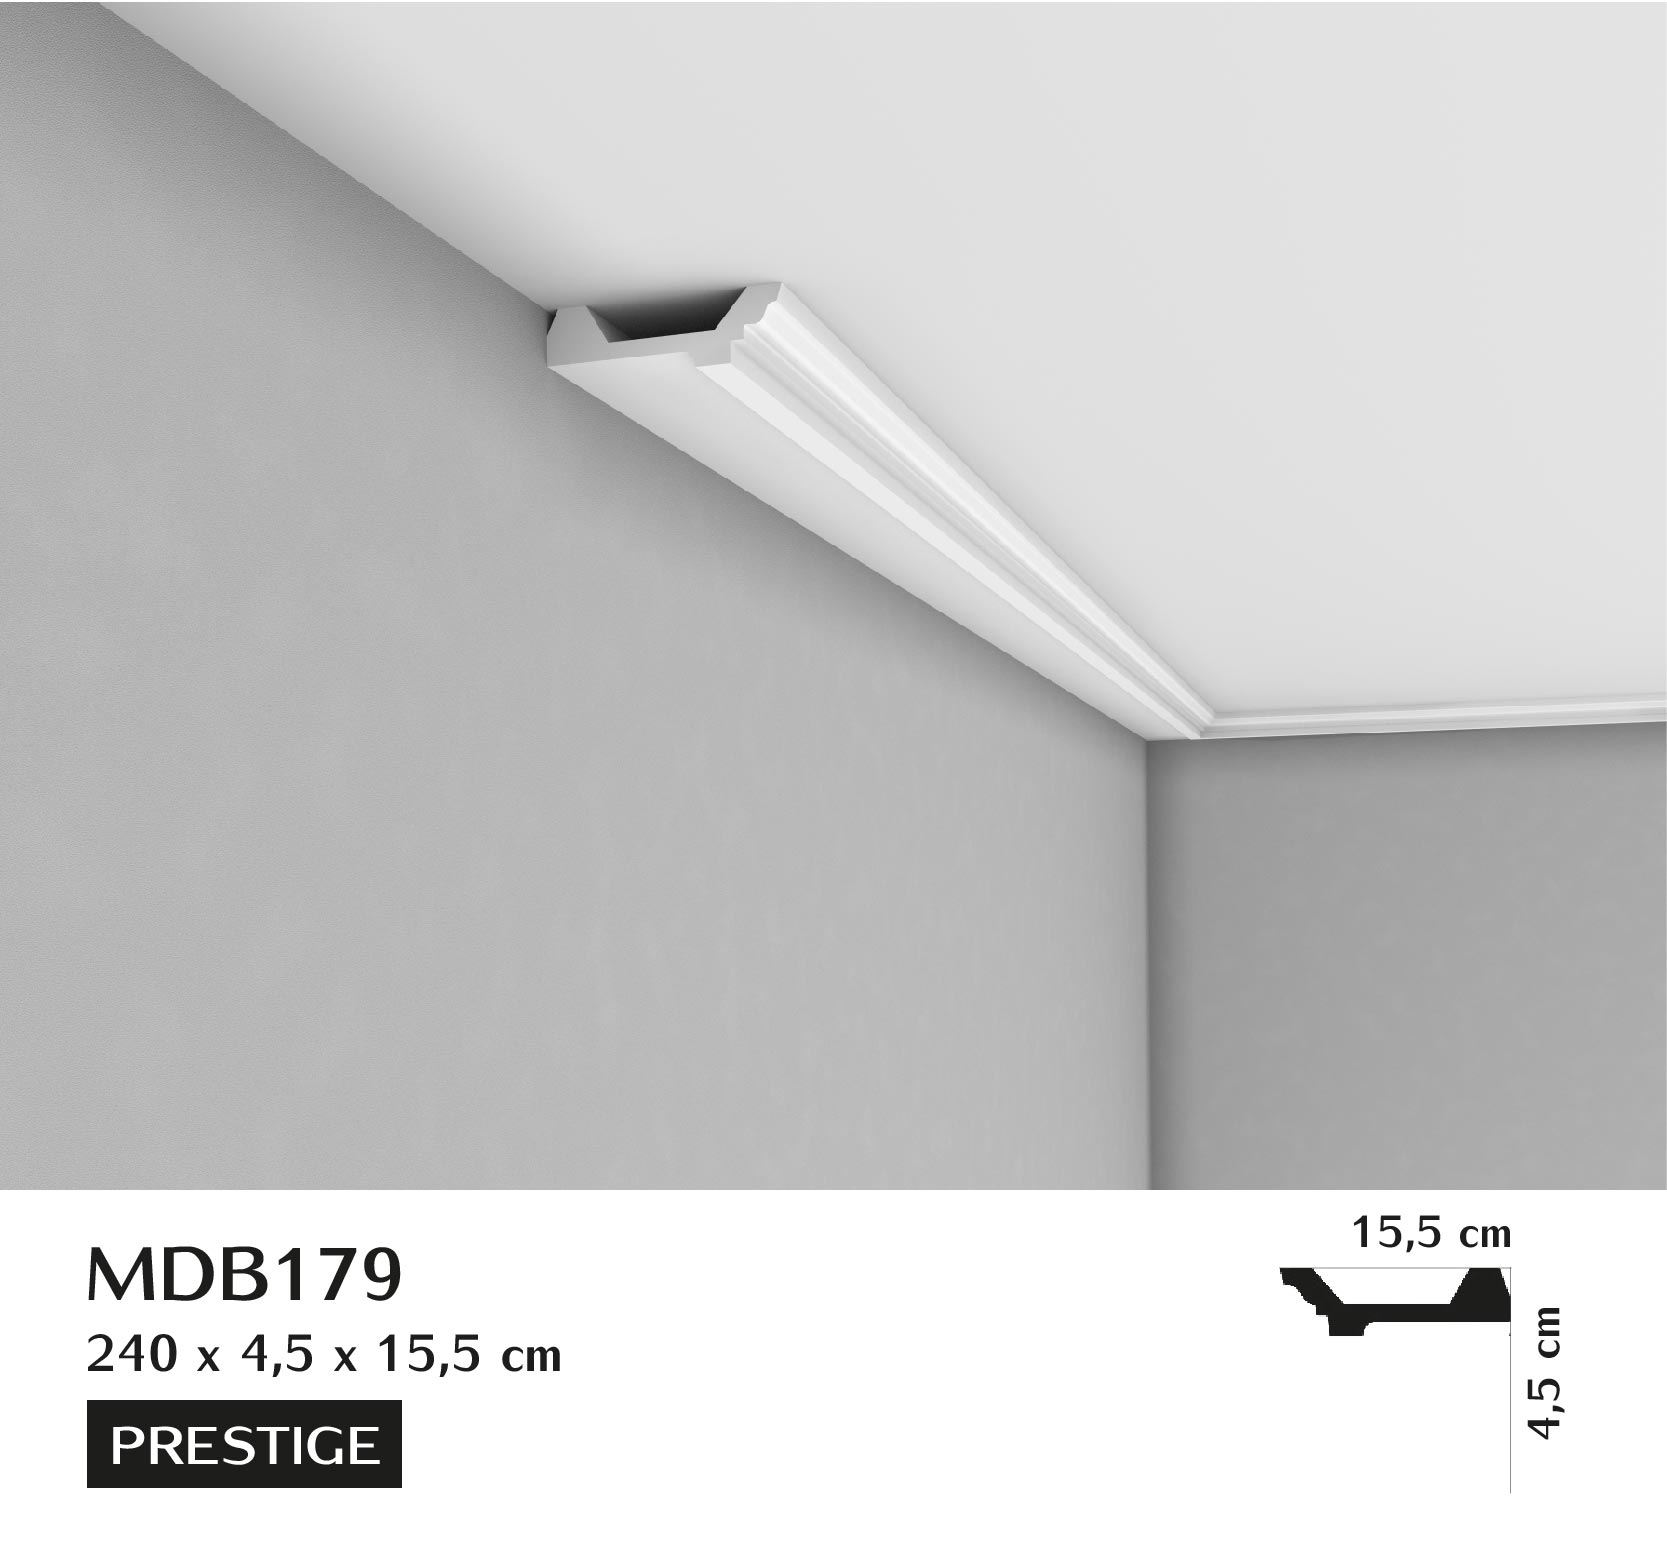 Mdb179